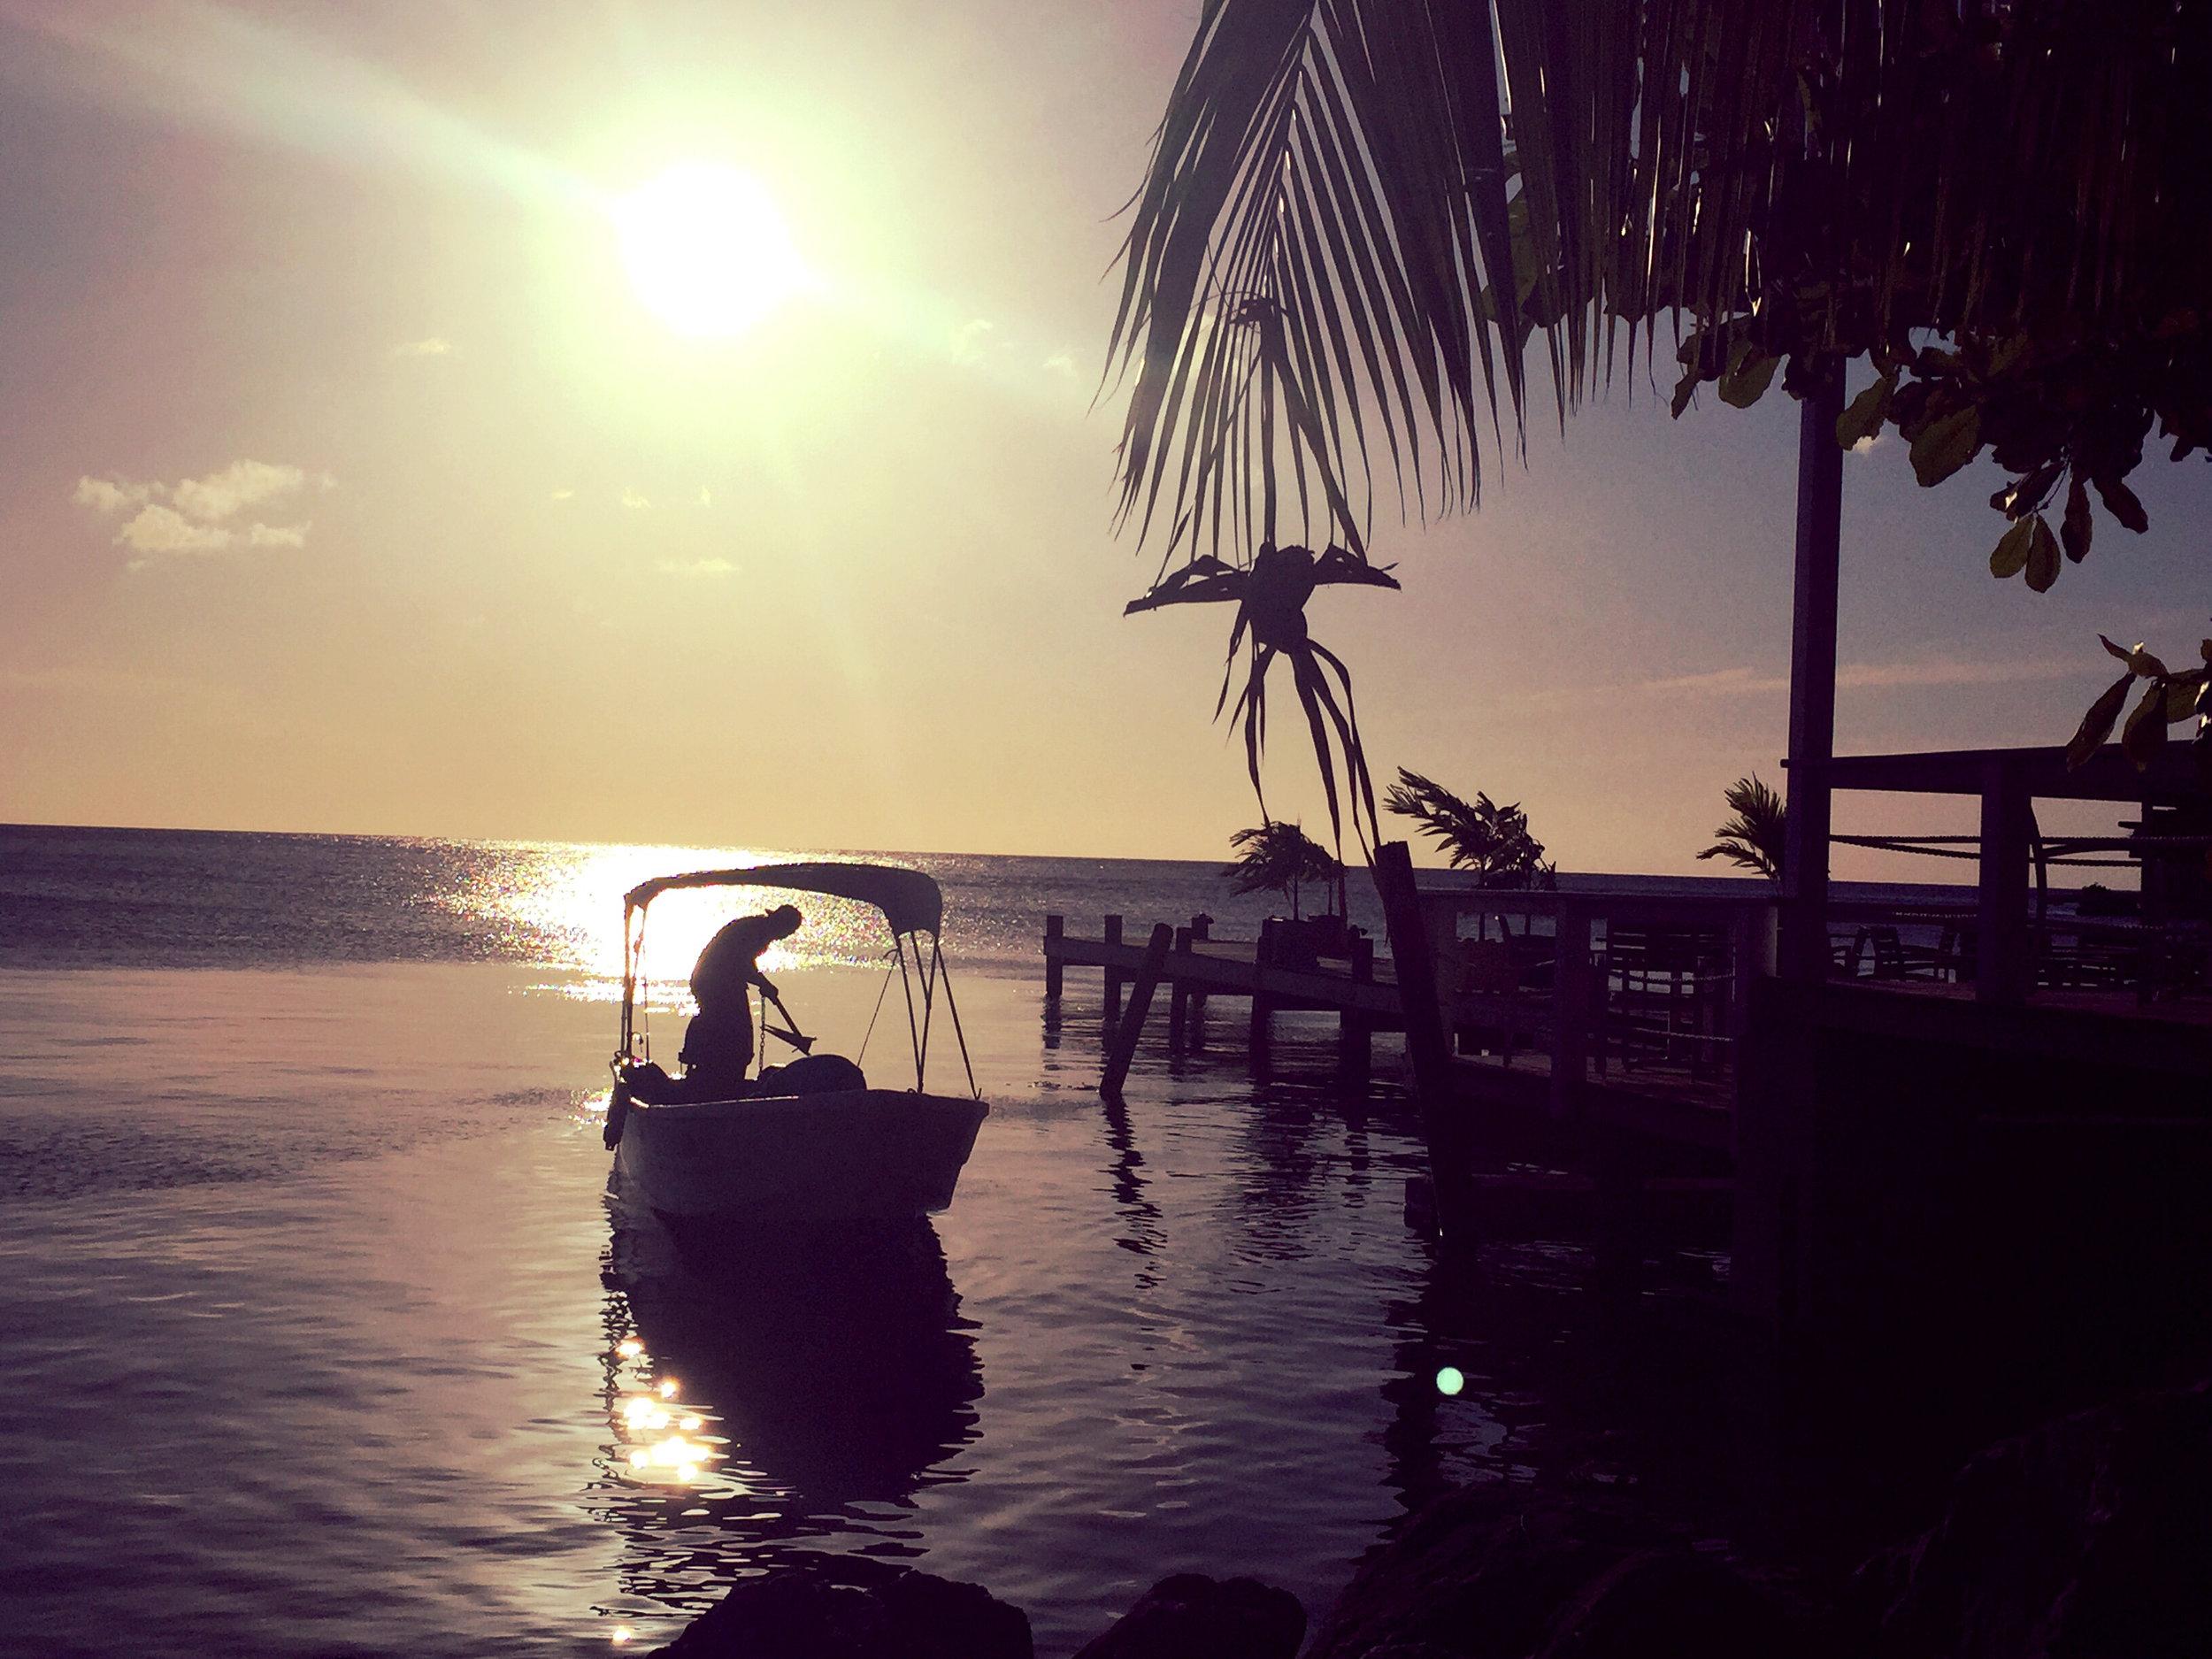 West End Pescador Roatan Honduras - Lulu Matute